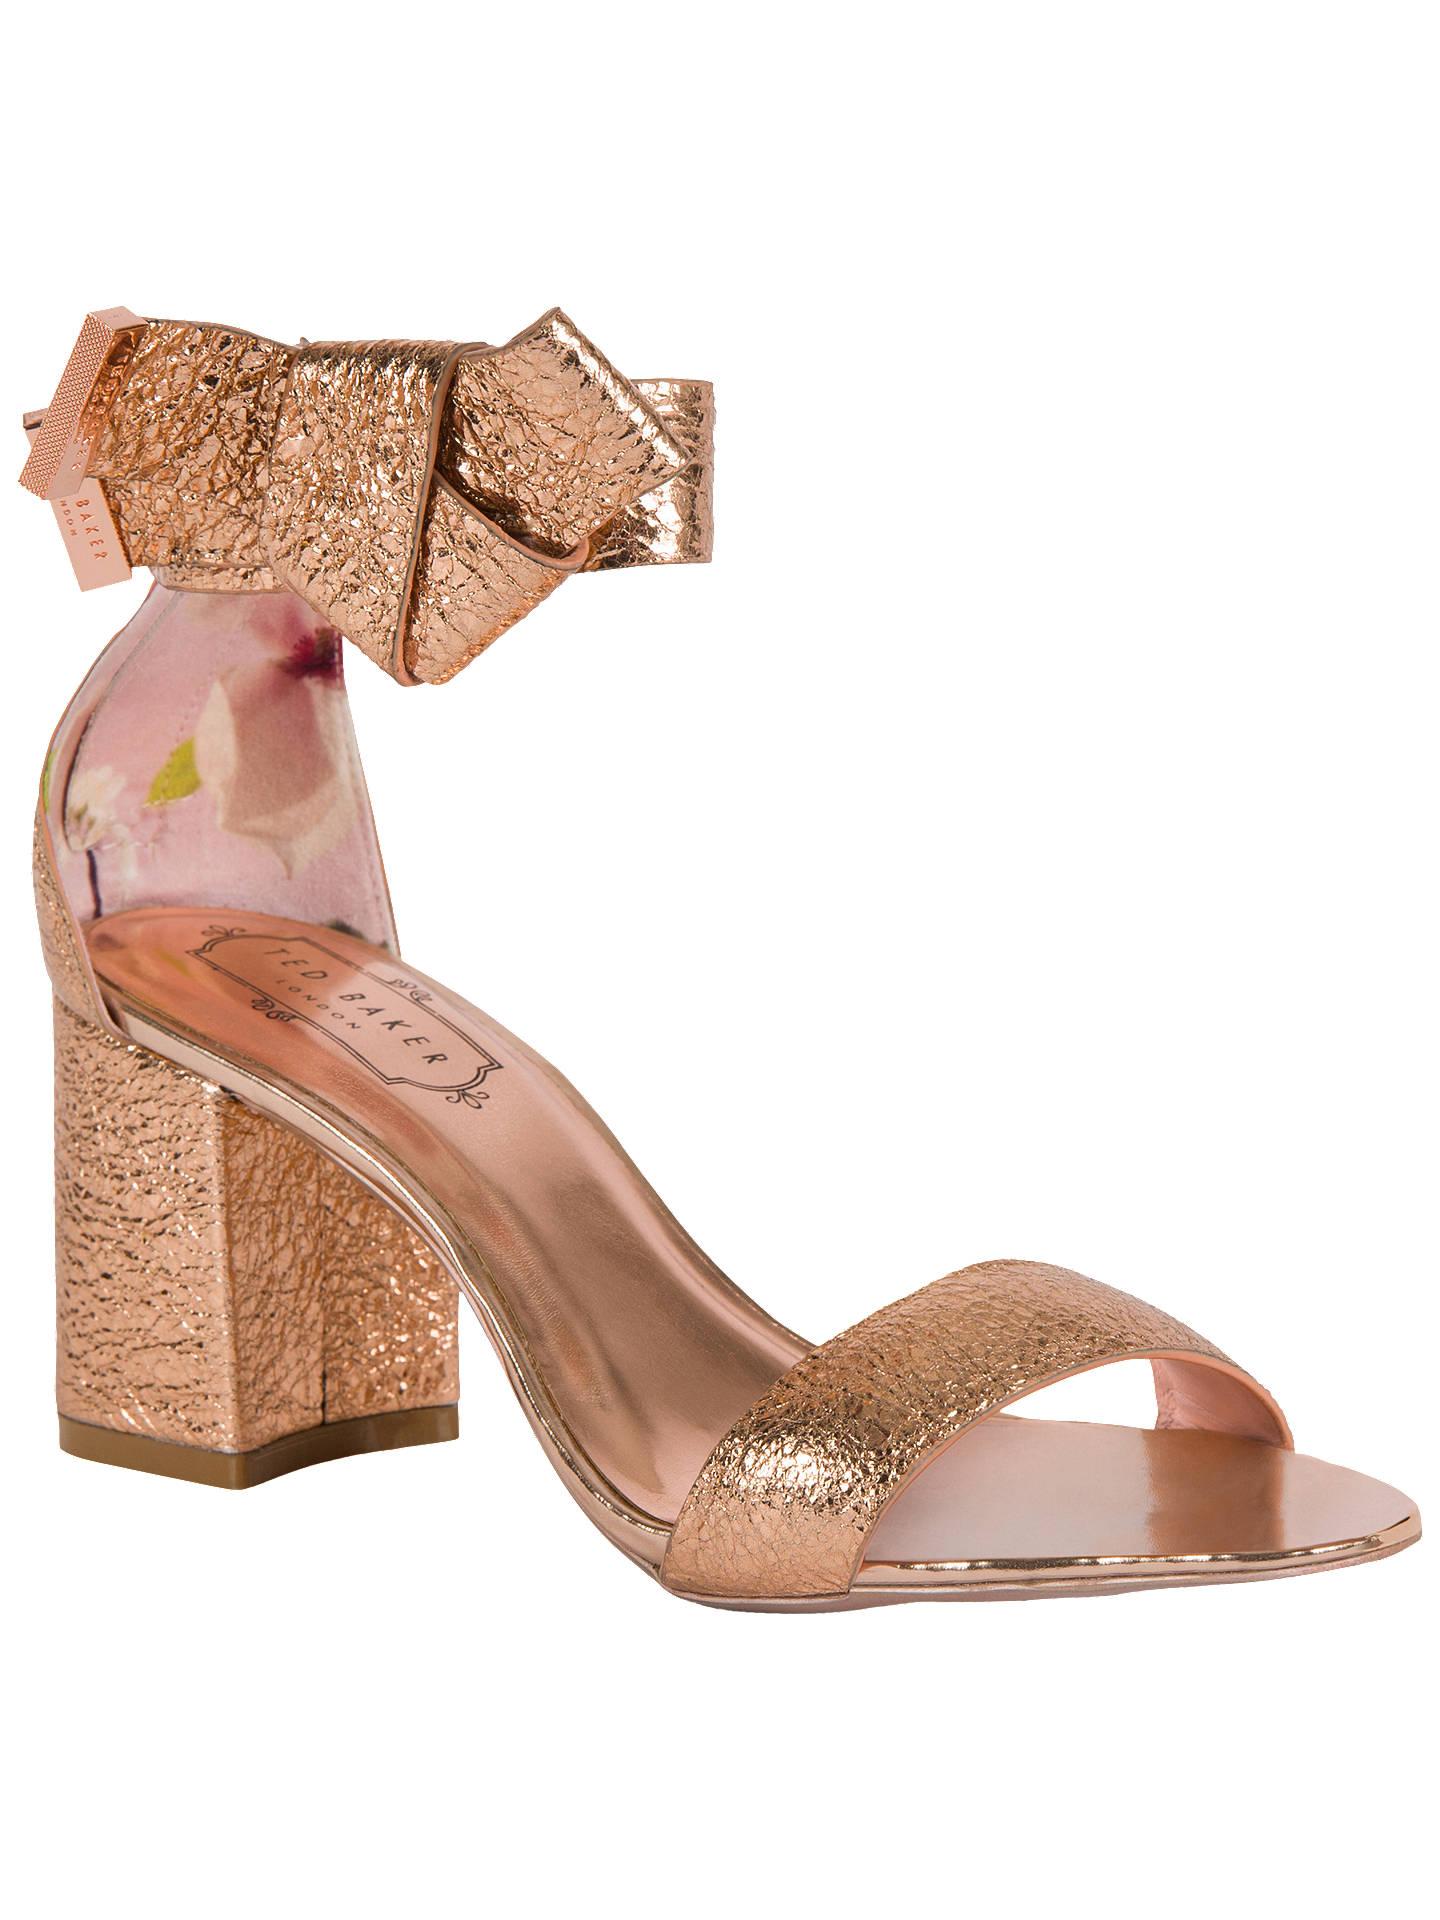 38e61bb3c Buy Ted Baker Kerria Block Heeled Sandals